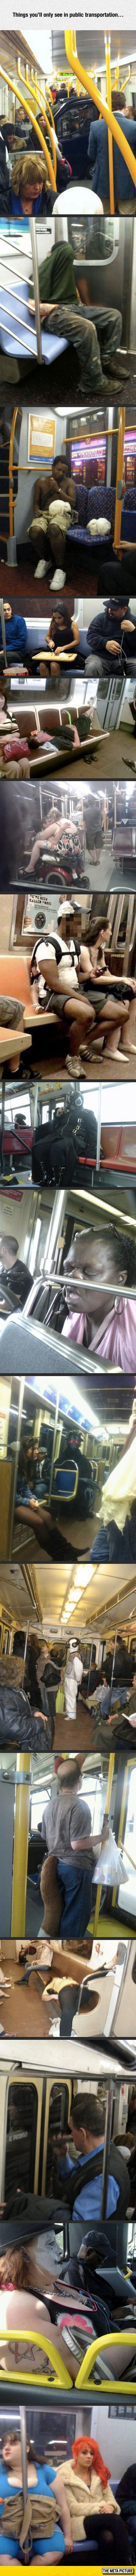 Public Transportation Gems